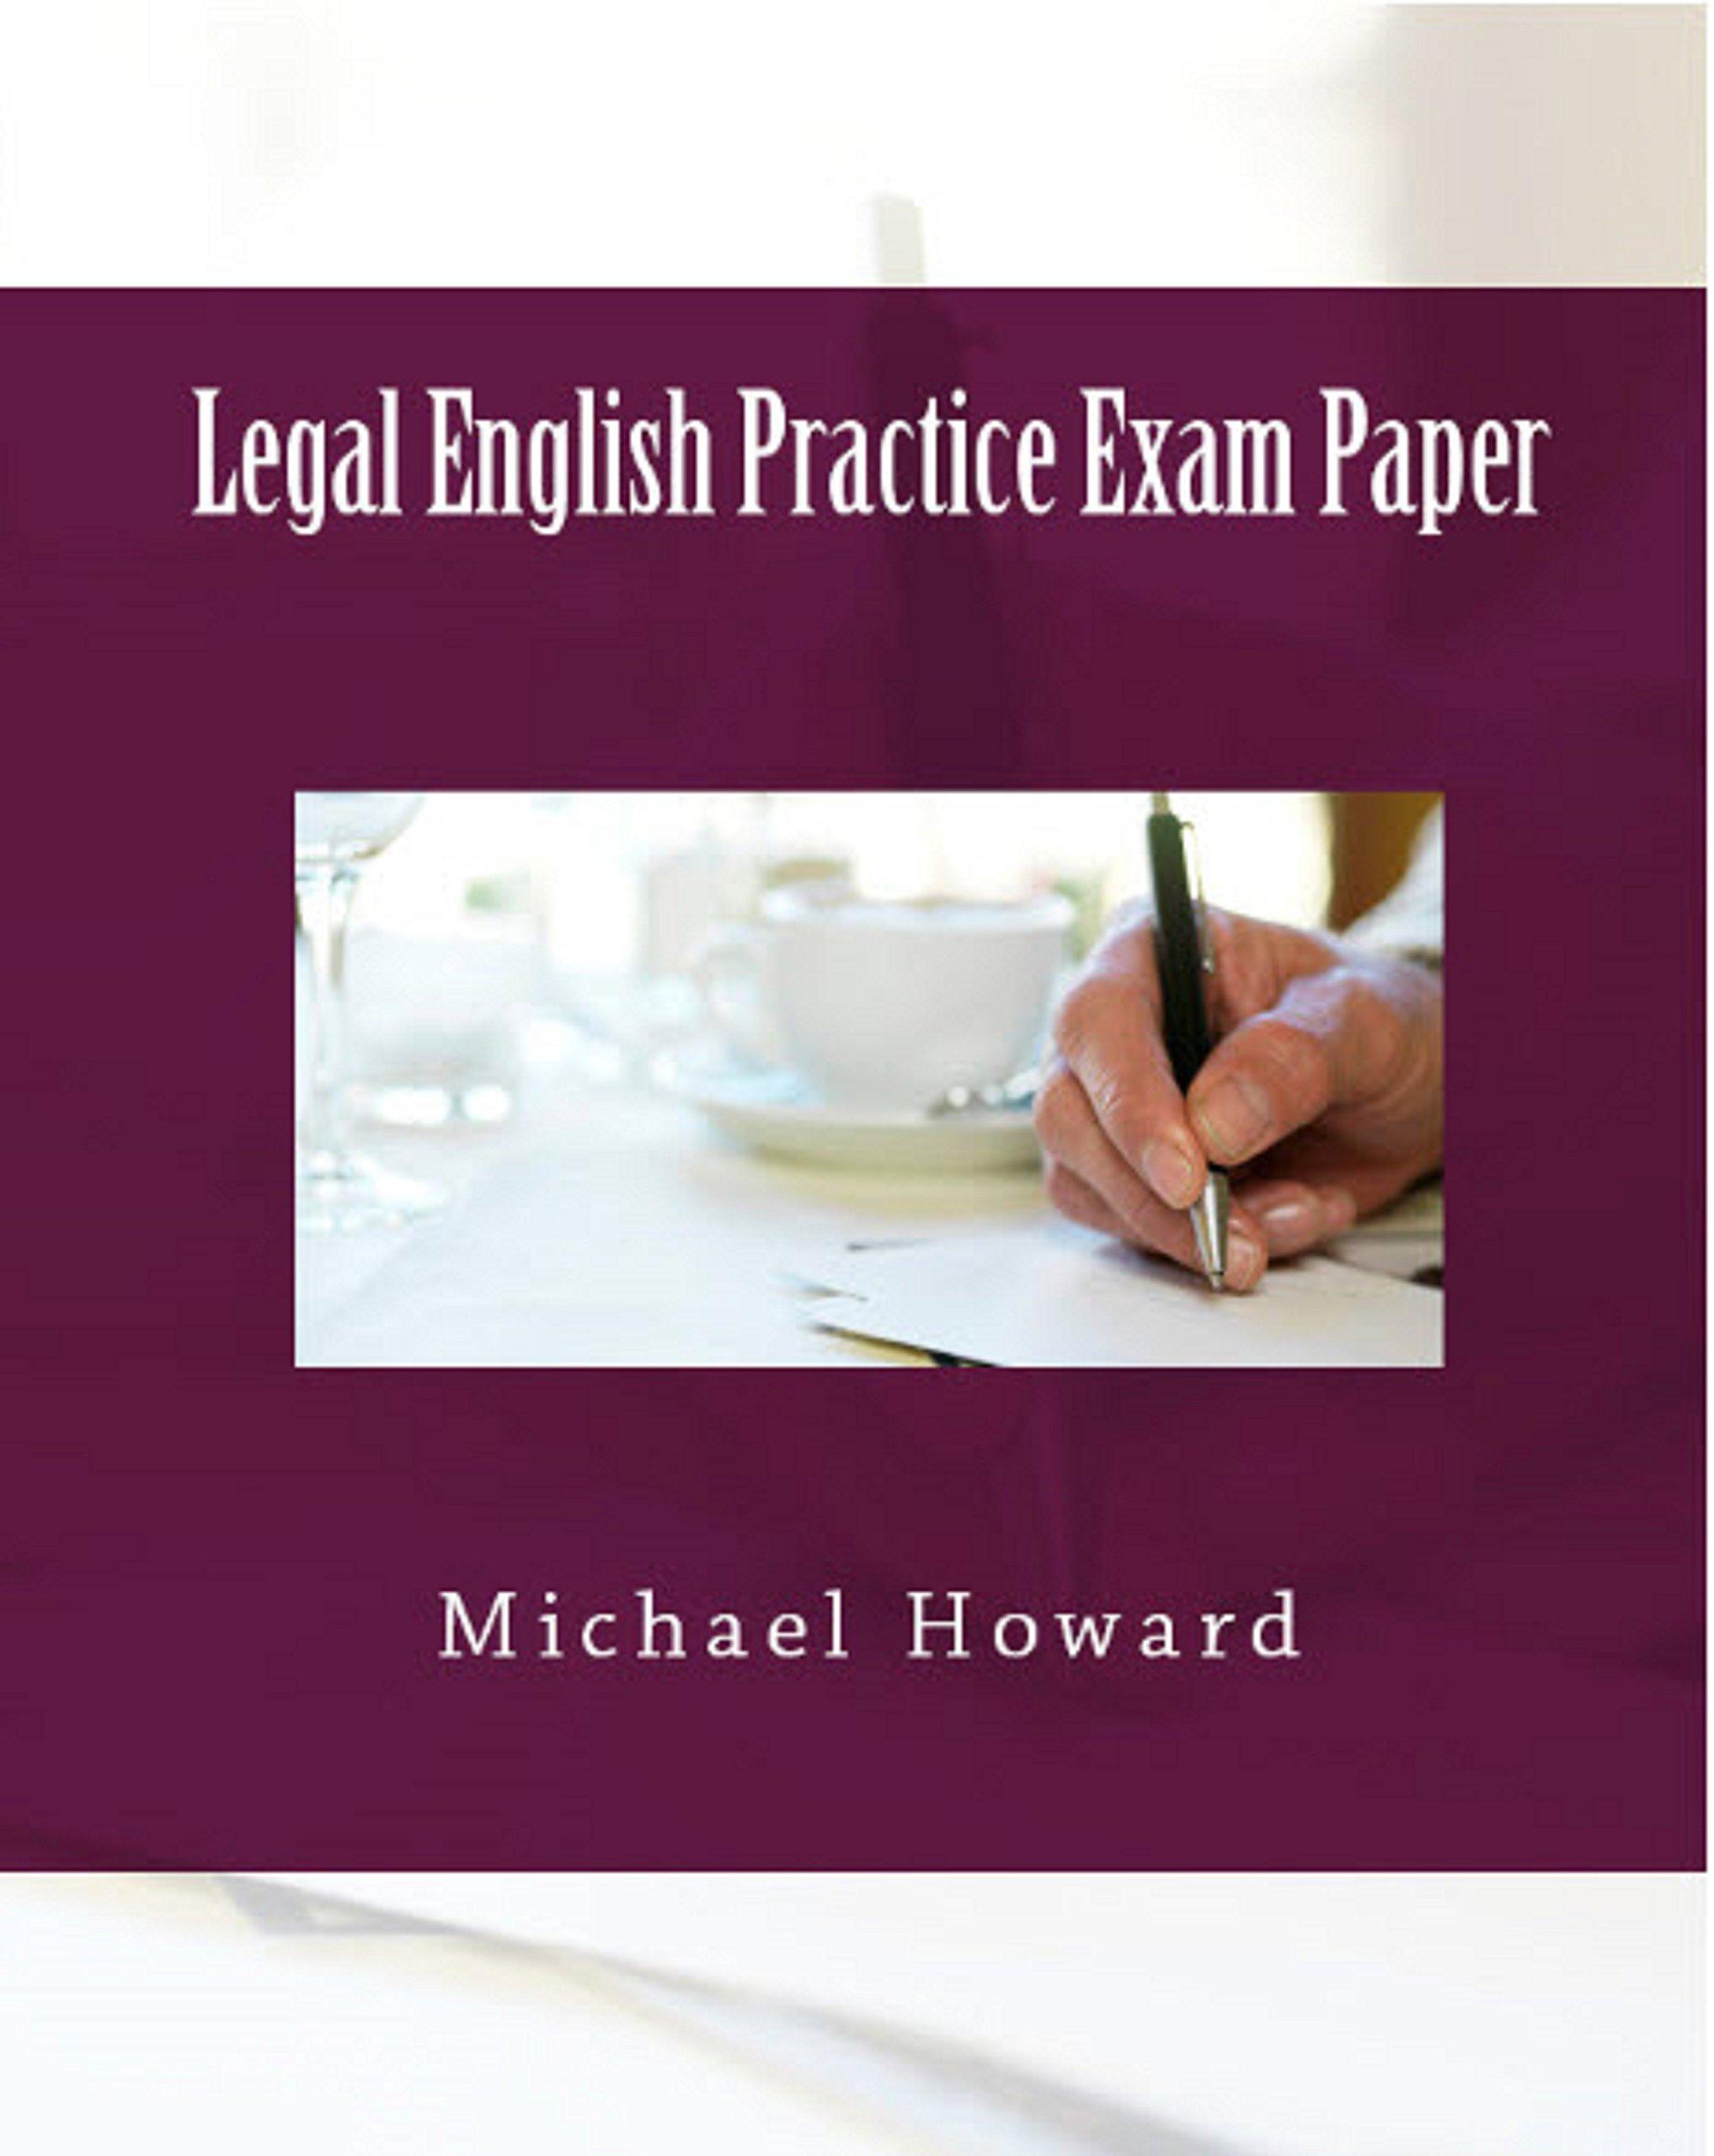 Legal English Practice Exam Paper  English Edition